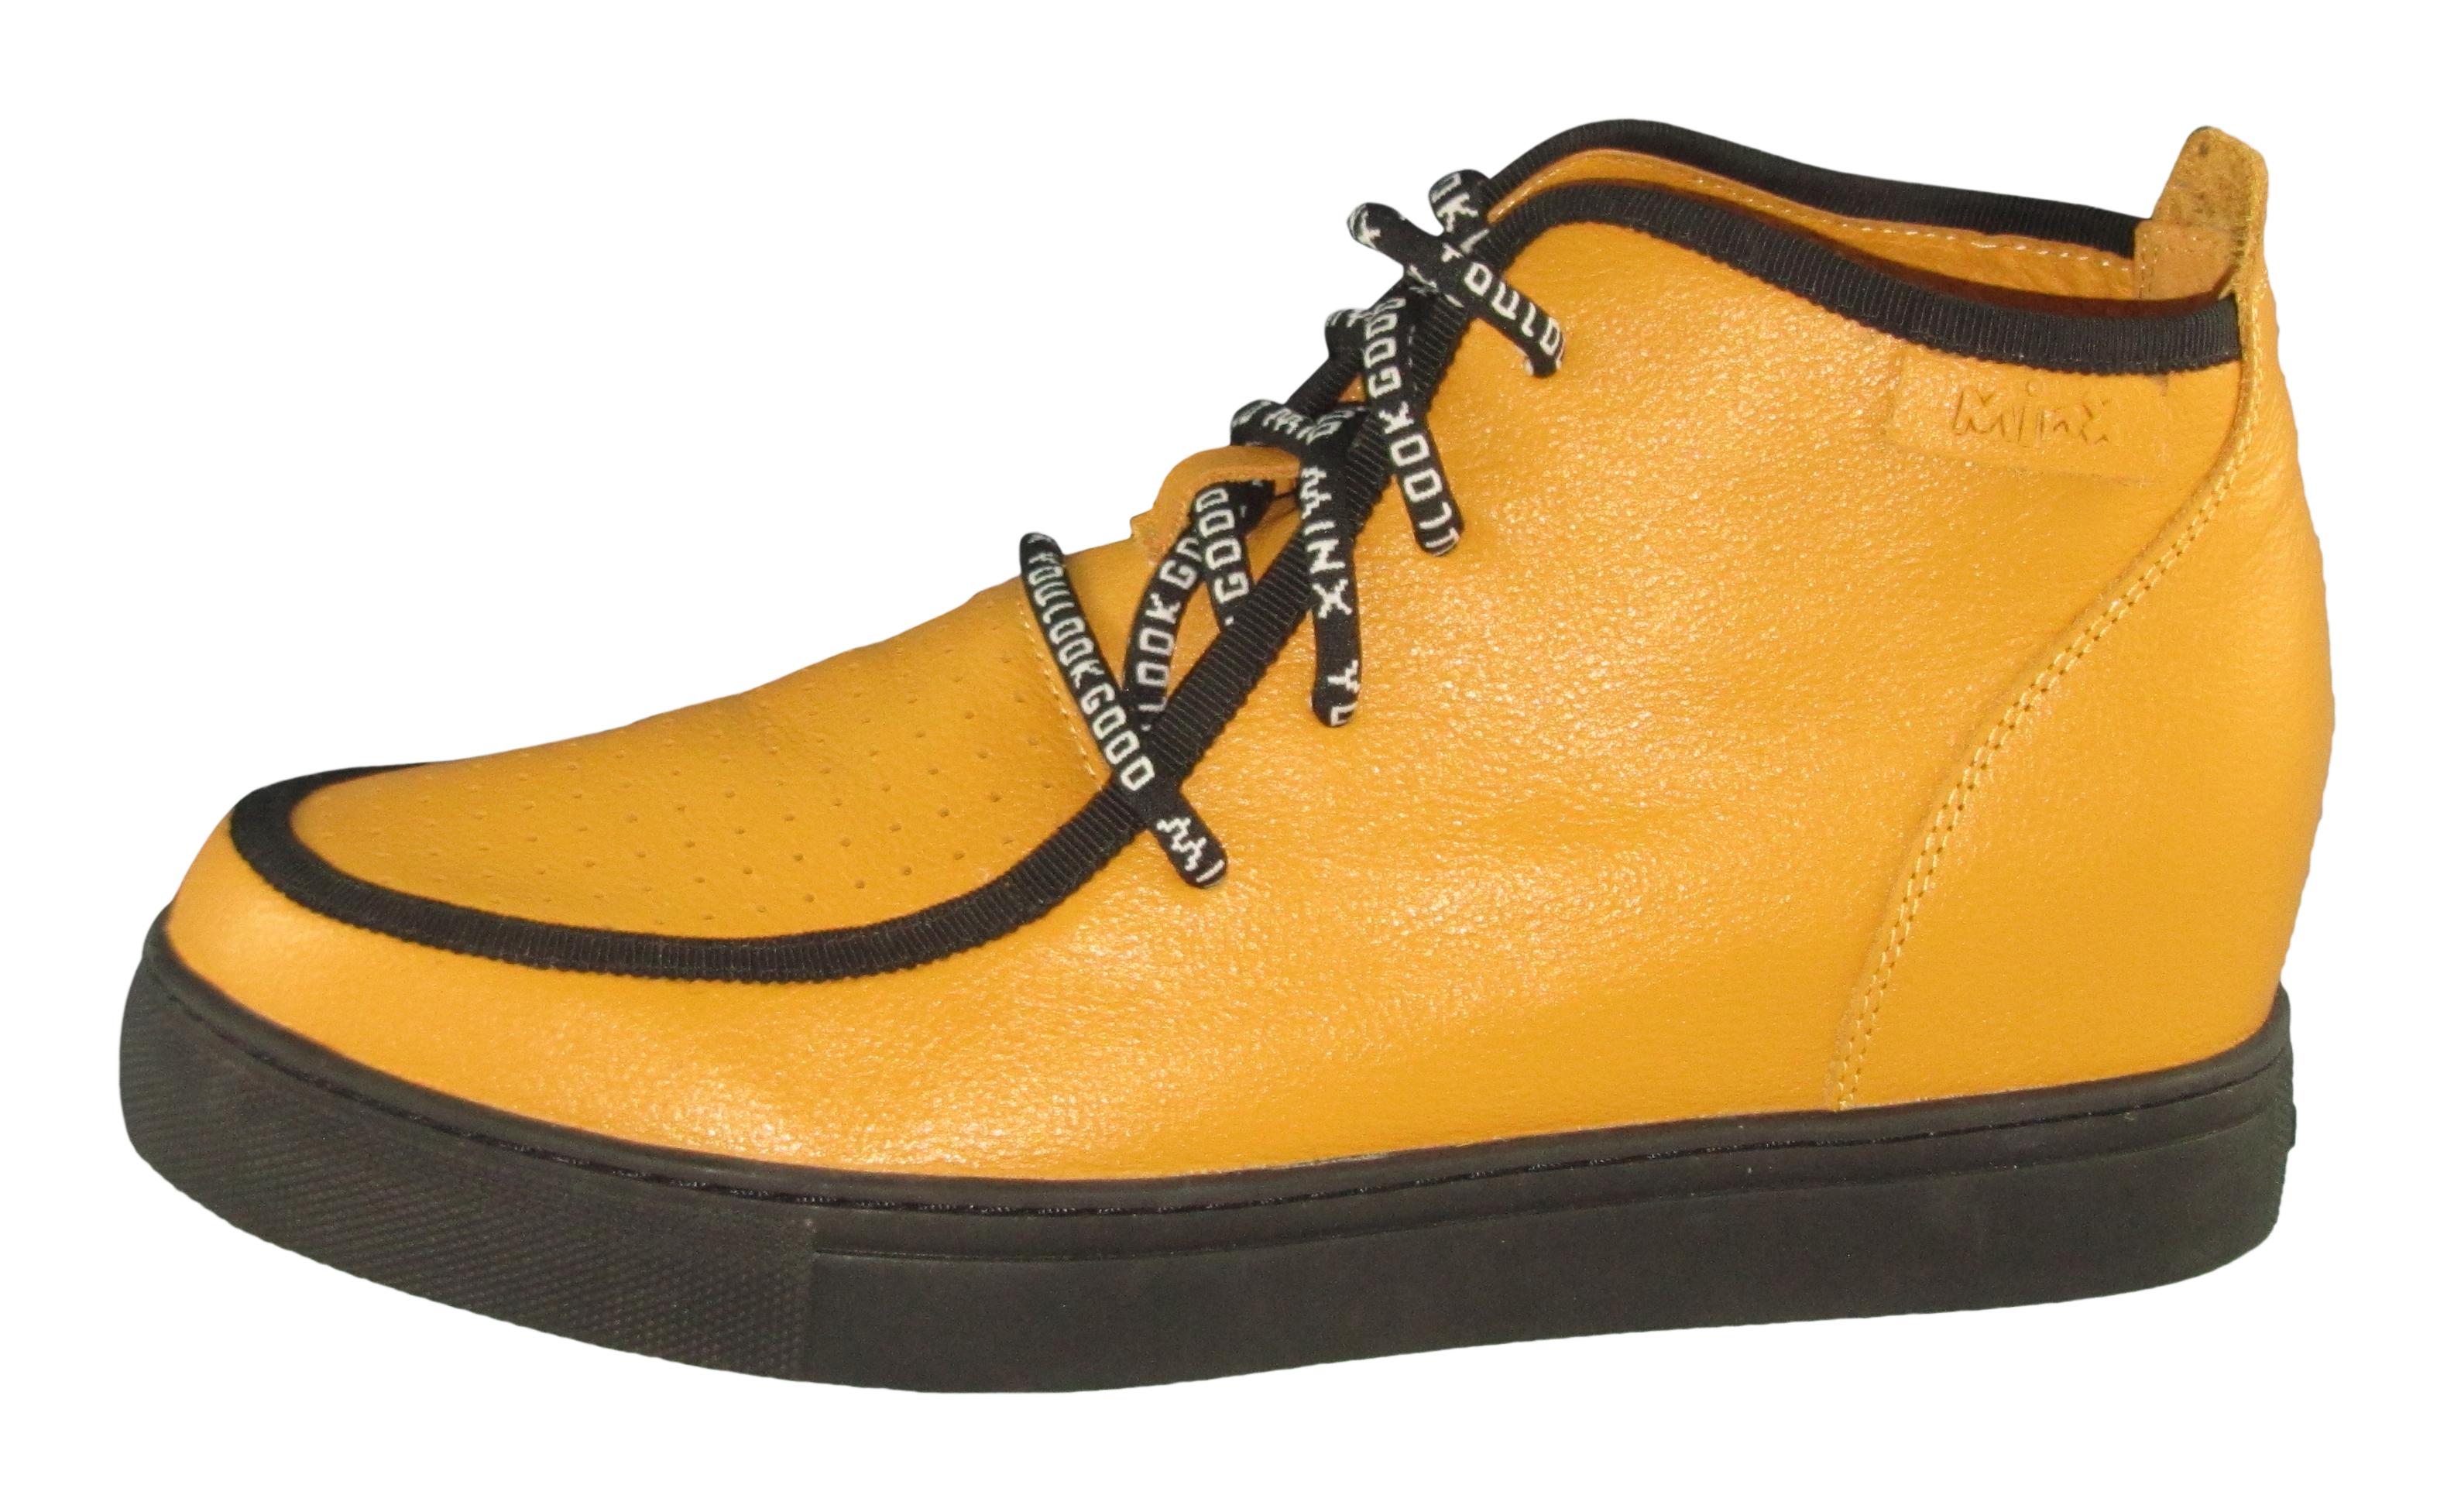 MINX BEES KNEES - SHOP BY BRAND-Minx : nz shoes online